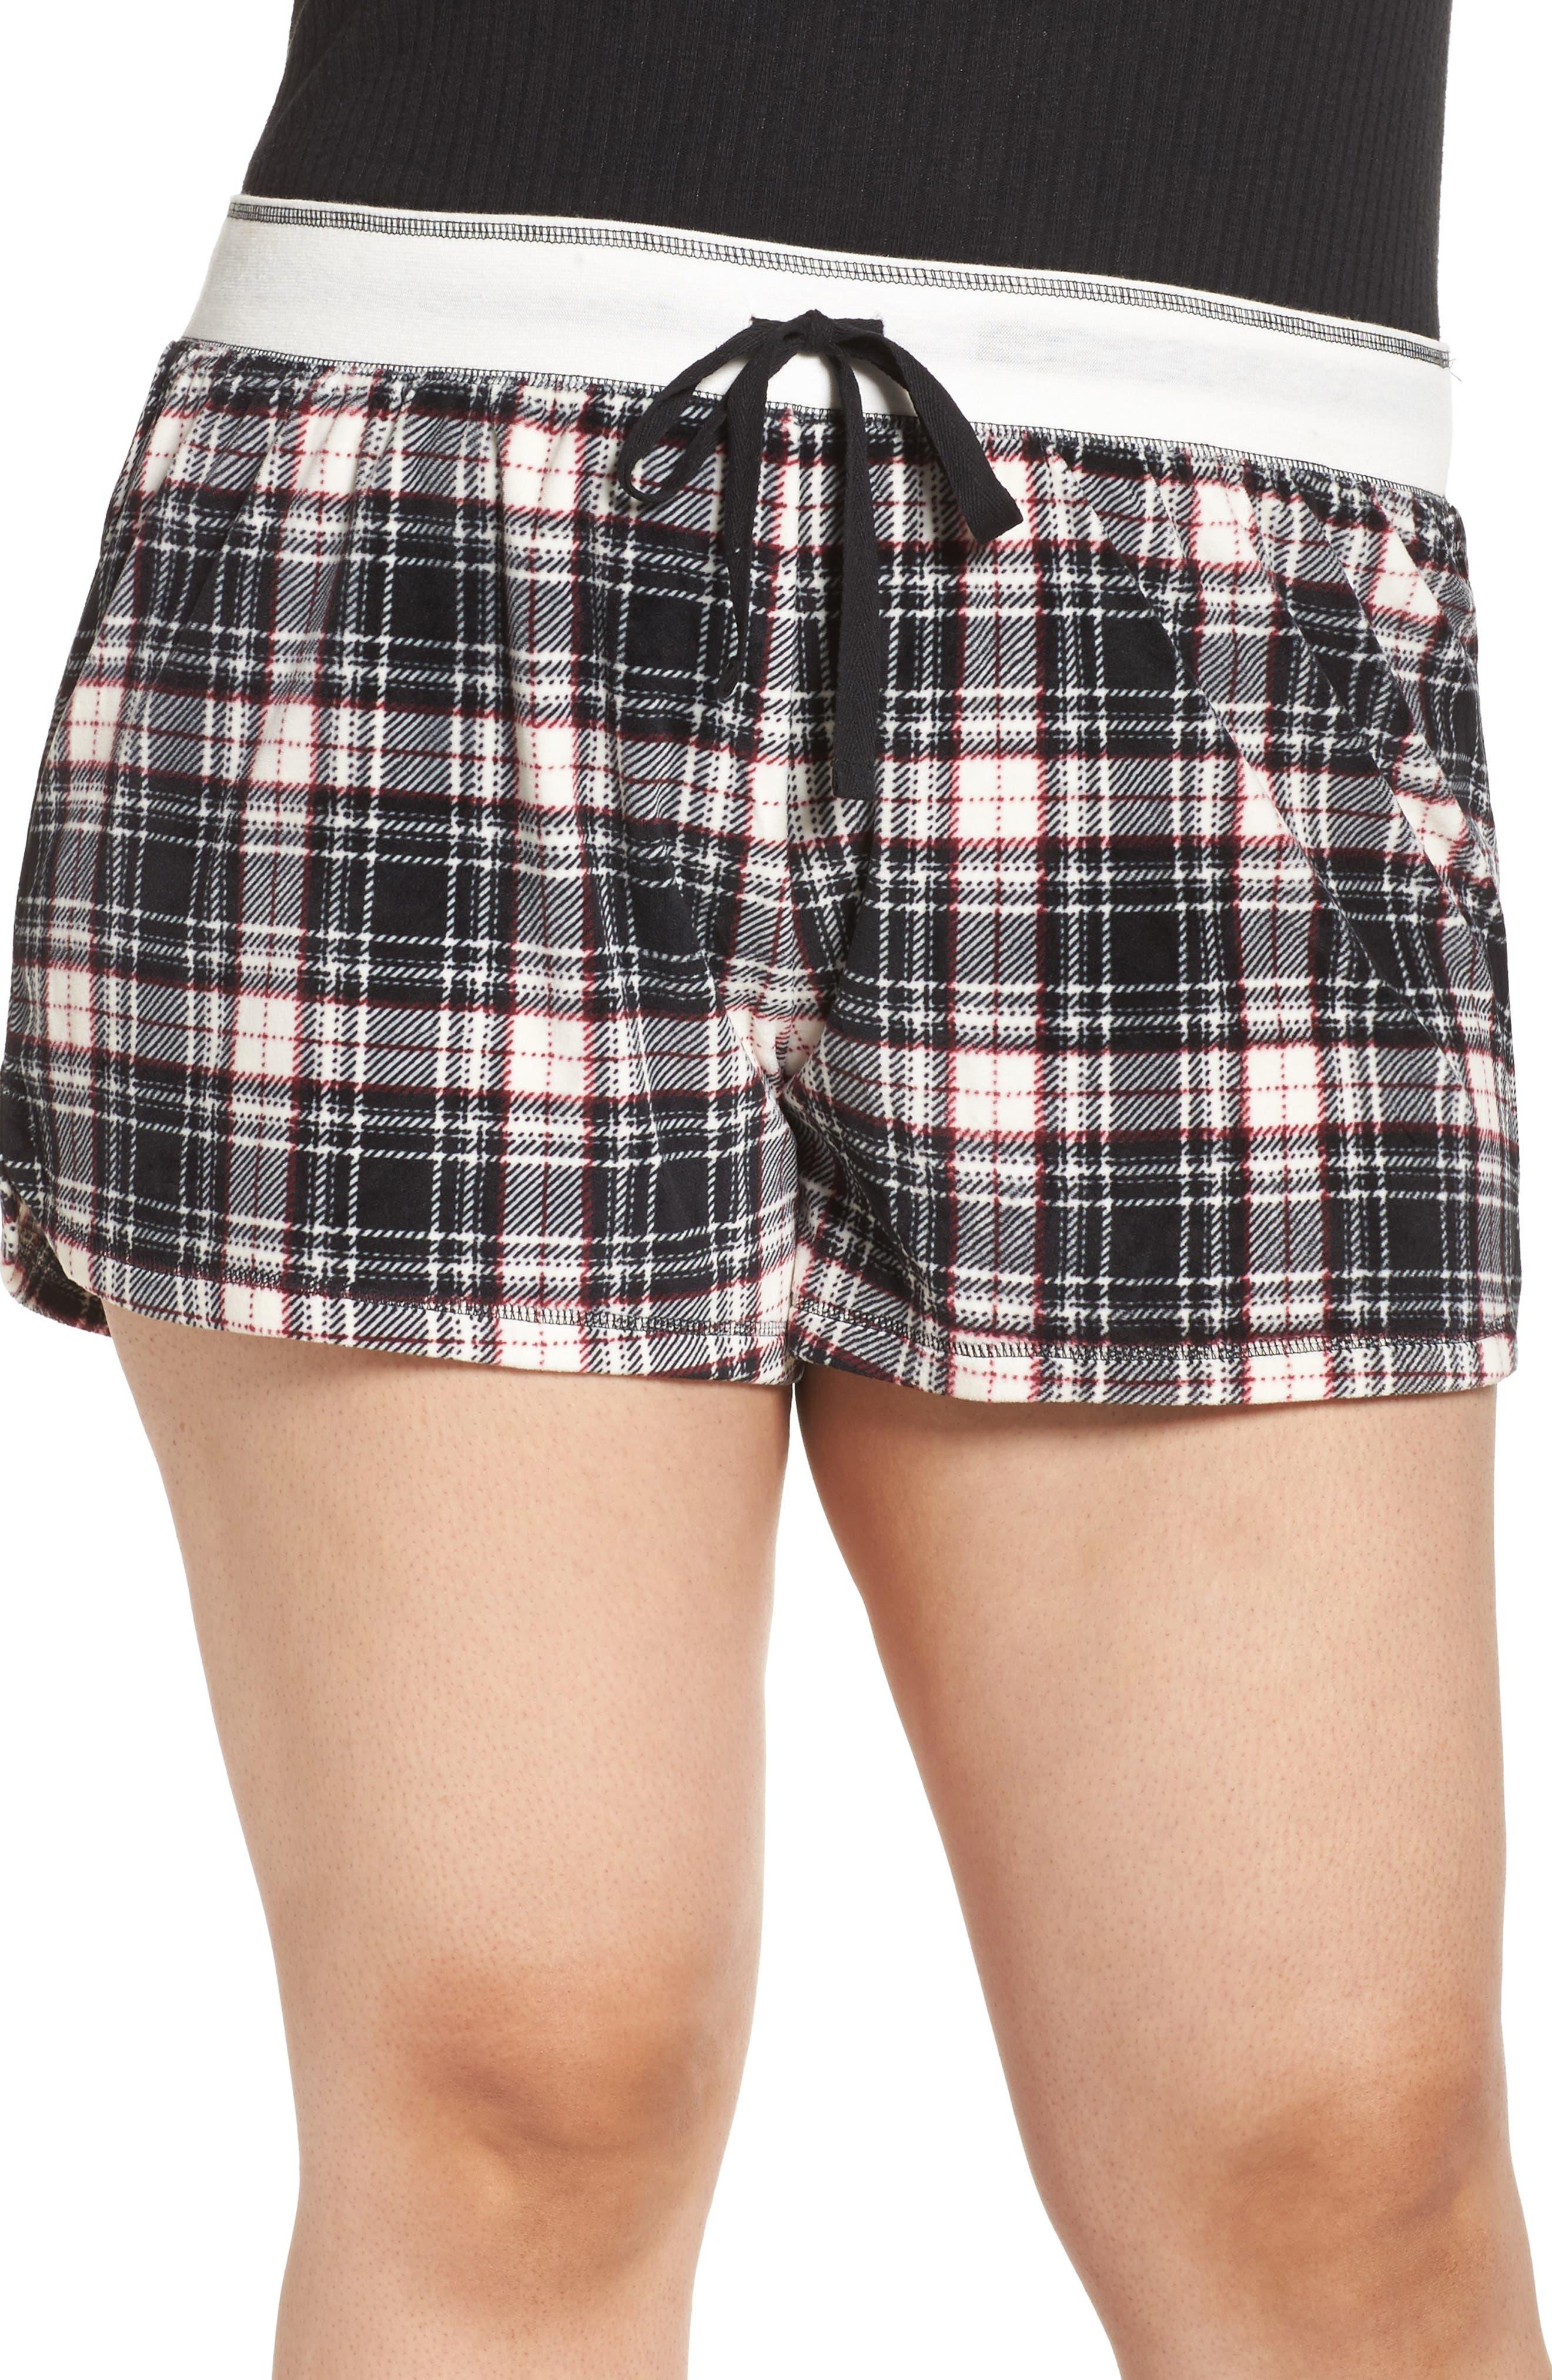 PJ Salvage Velour Shorts (Plus Size)